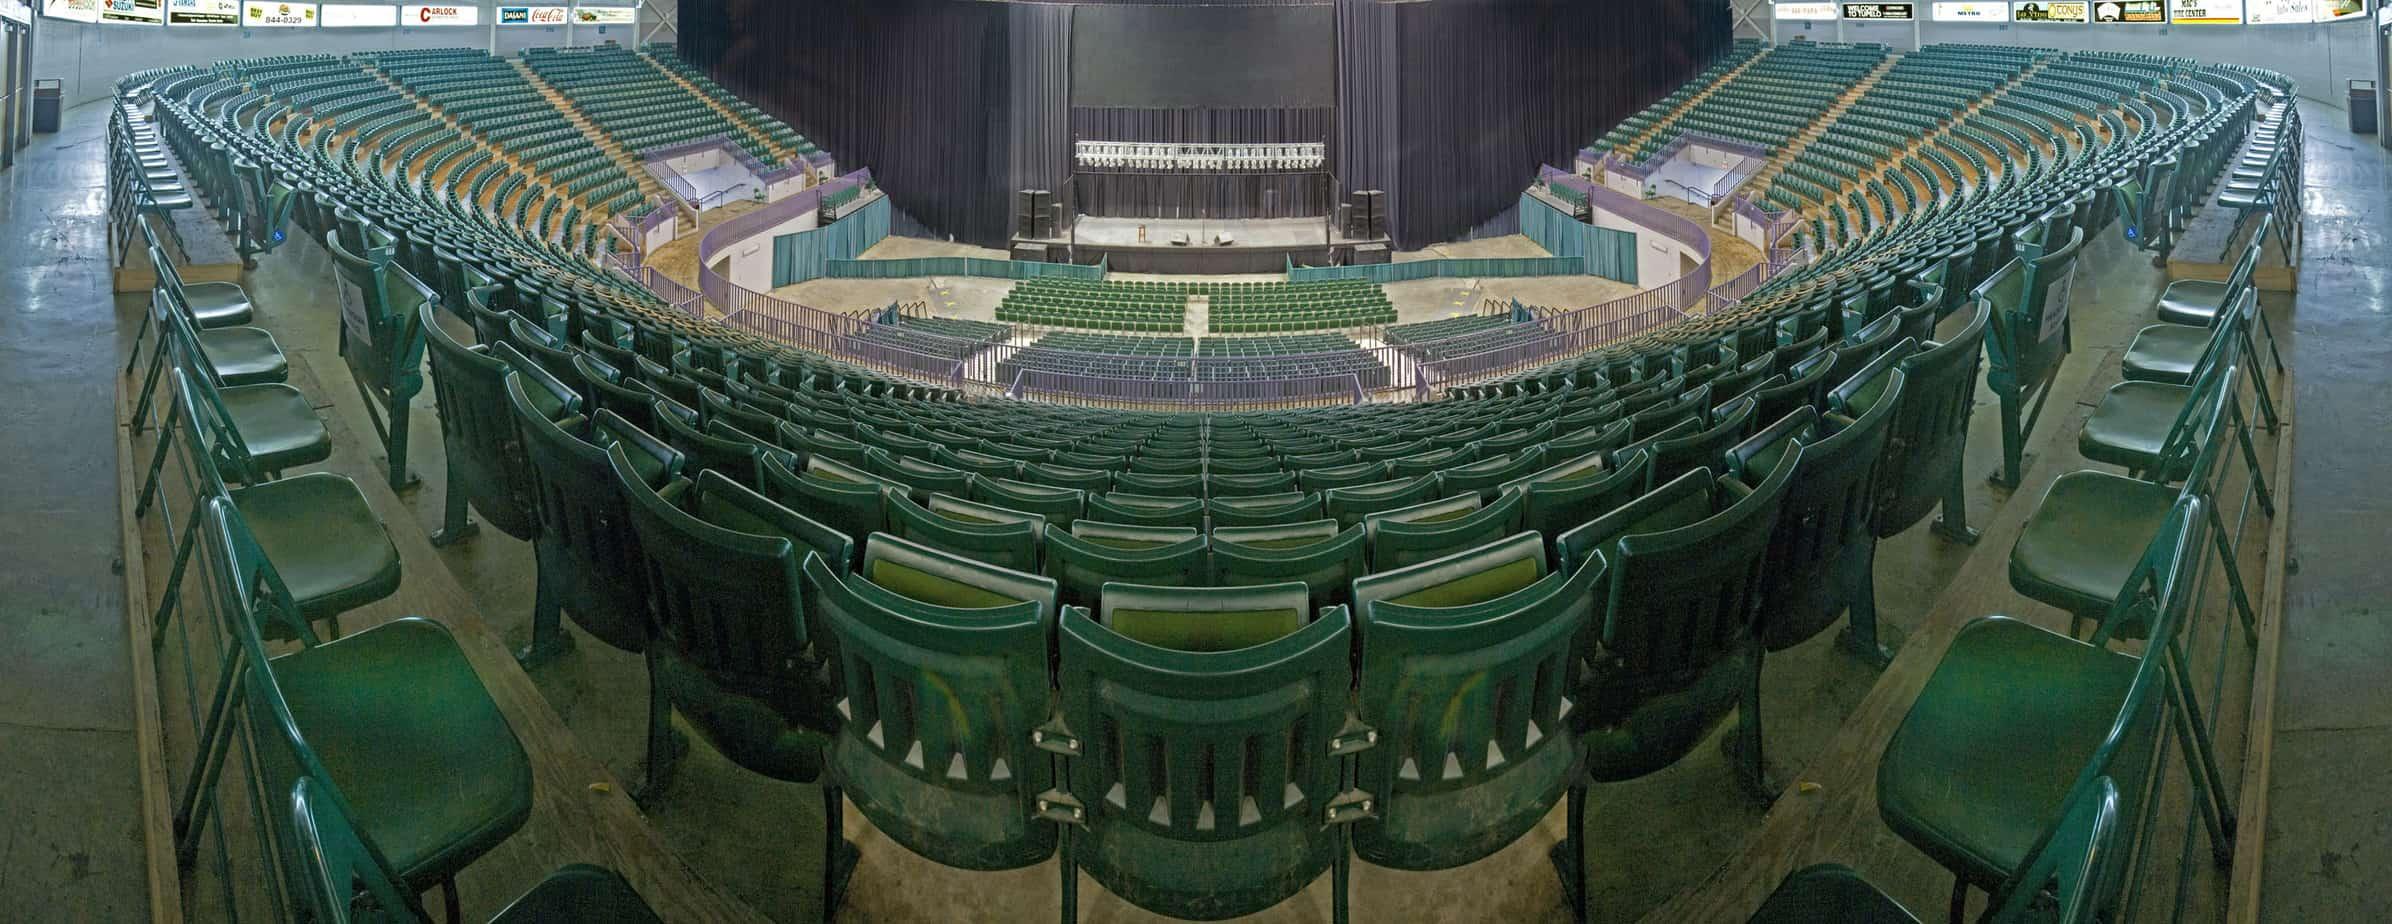 Bancorpsouth Arena Venue Coalition